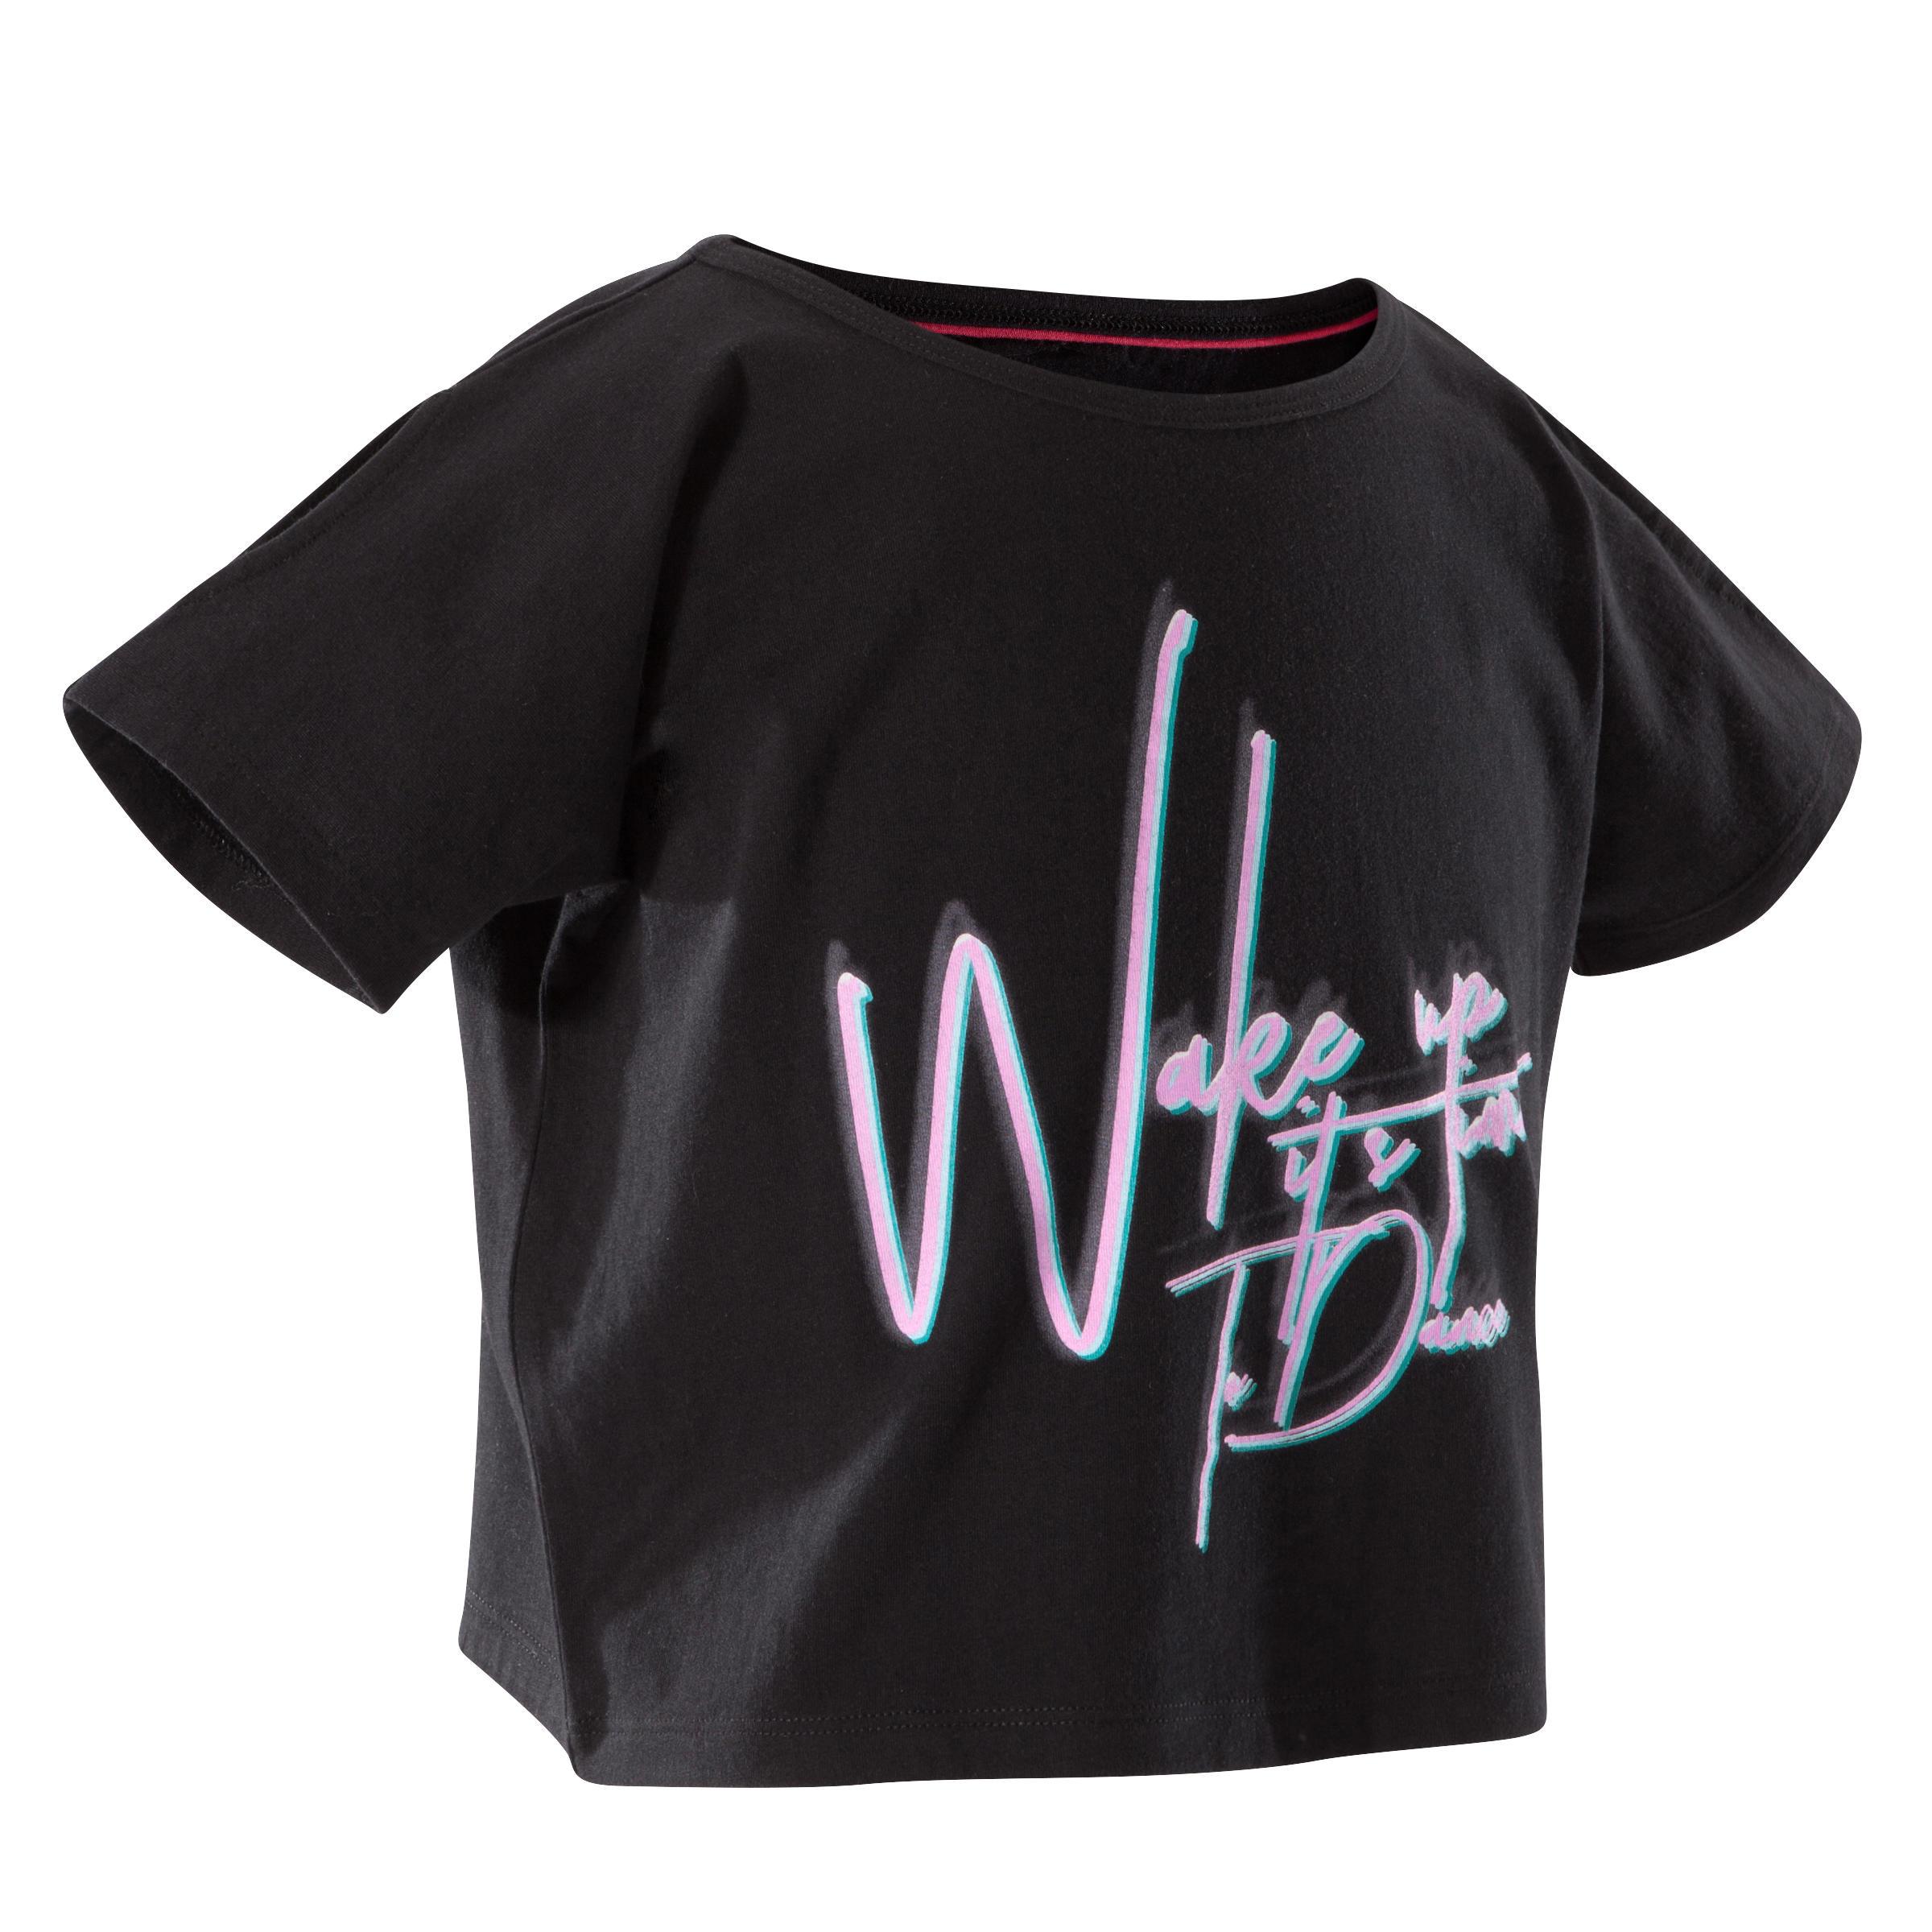 Girls' Short Loose Short-Sleeved Dance T-Shirt - Black